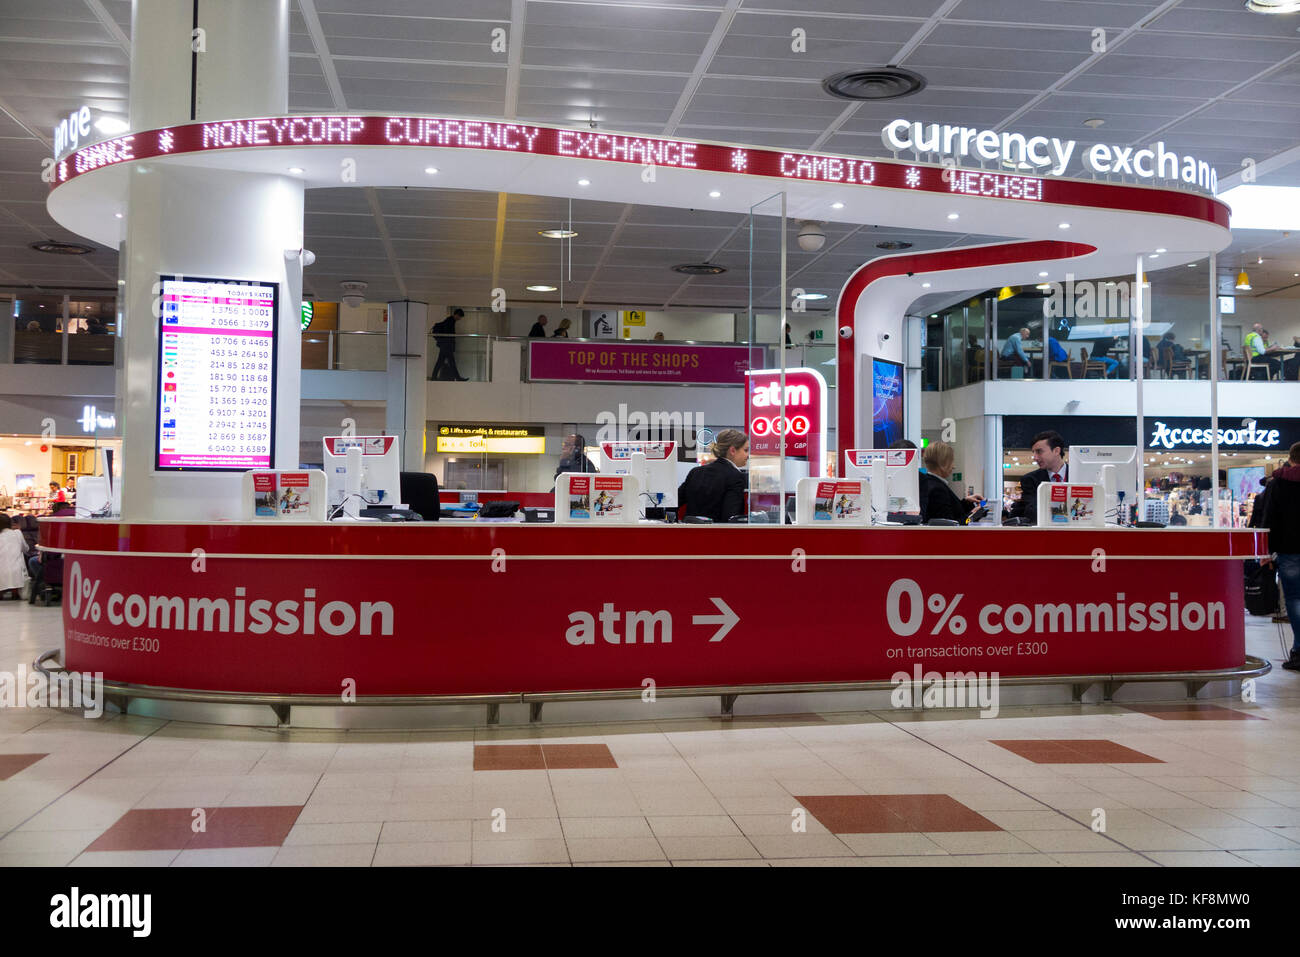 money exchange airport stock photos money exchange airport stock images alamy. Black Bedroom Furniture Sets. Home Design Ideas